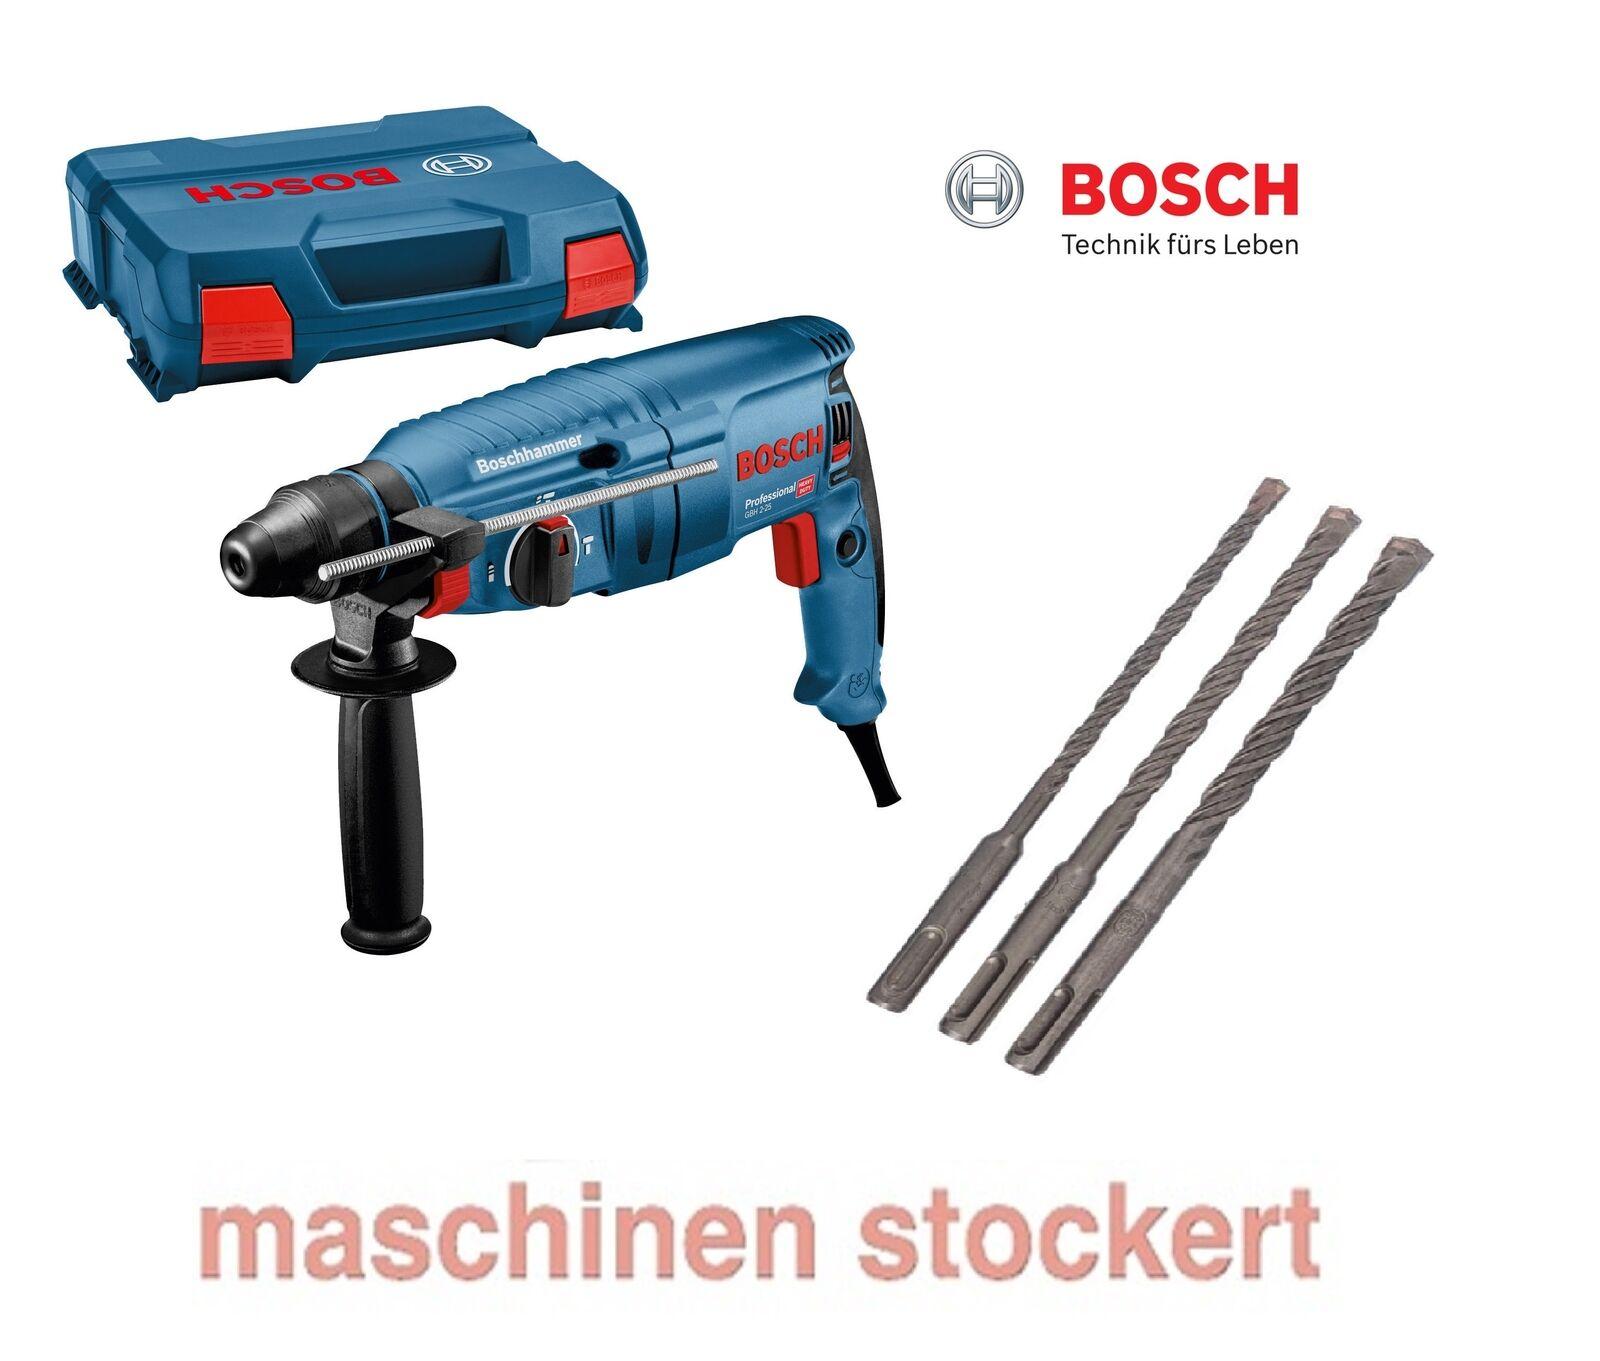 Bosch GBH 2-25 Blau Edition Bohrhammer, SDS-plus, L-Case - mit 3 tlg. Bohrer-Set